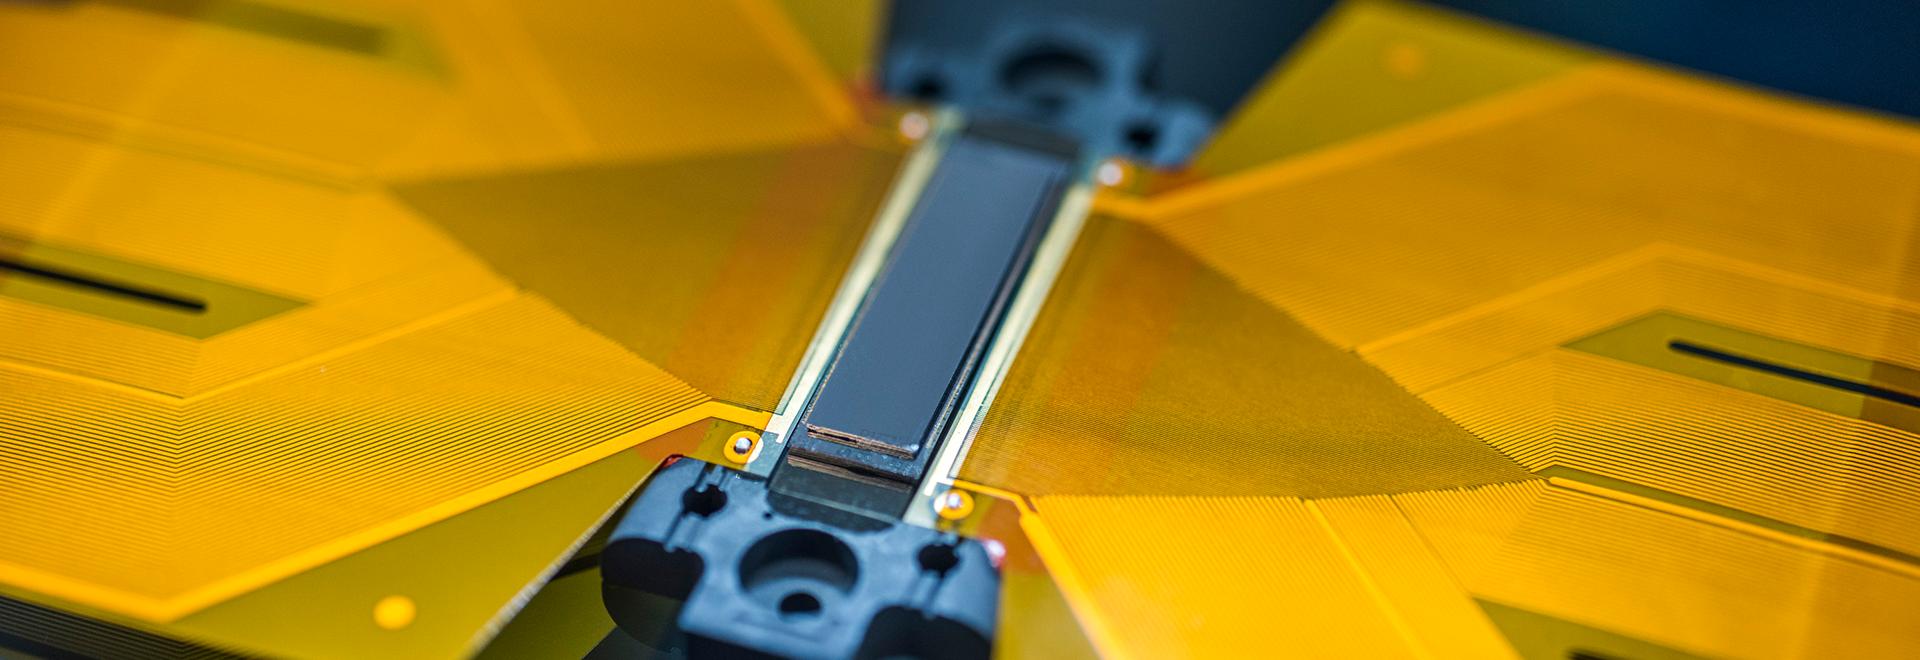 MEMS inkjet printhead